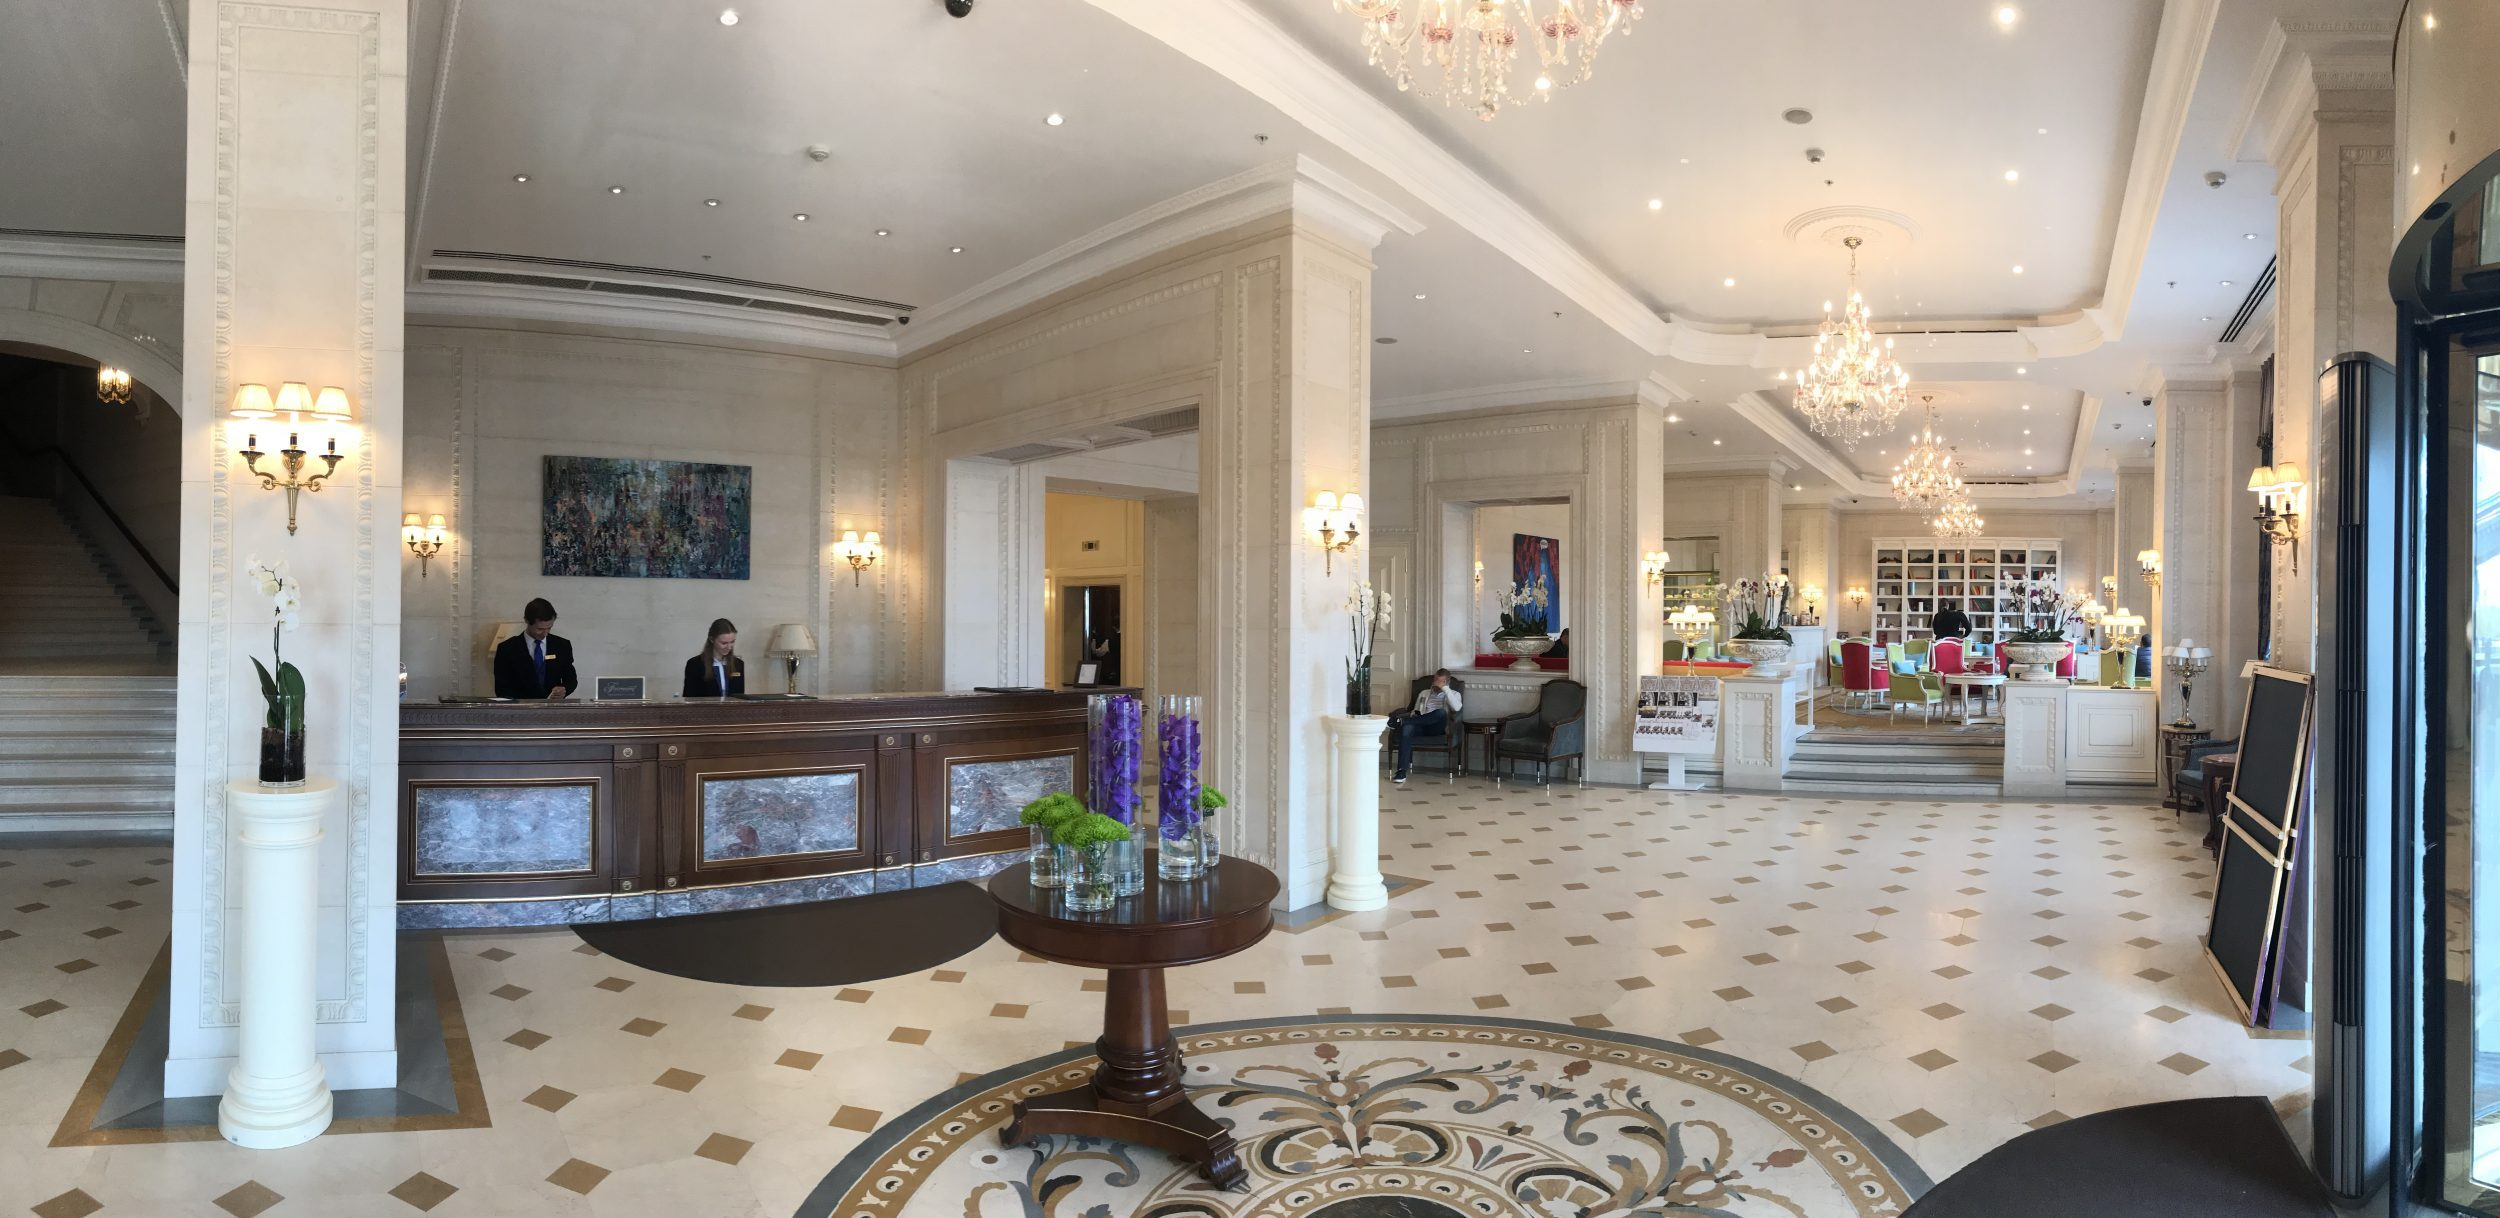 Fairmont-hotel-kyiv